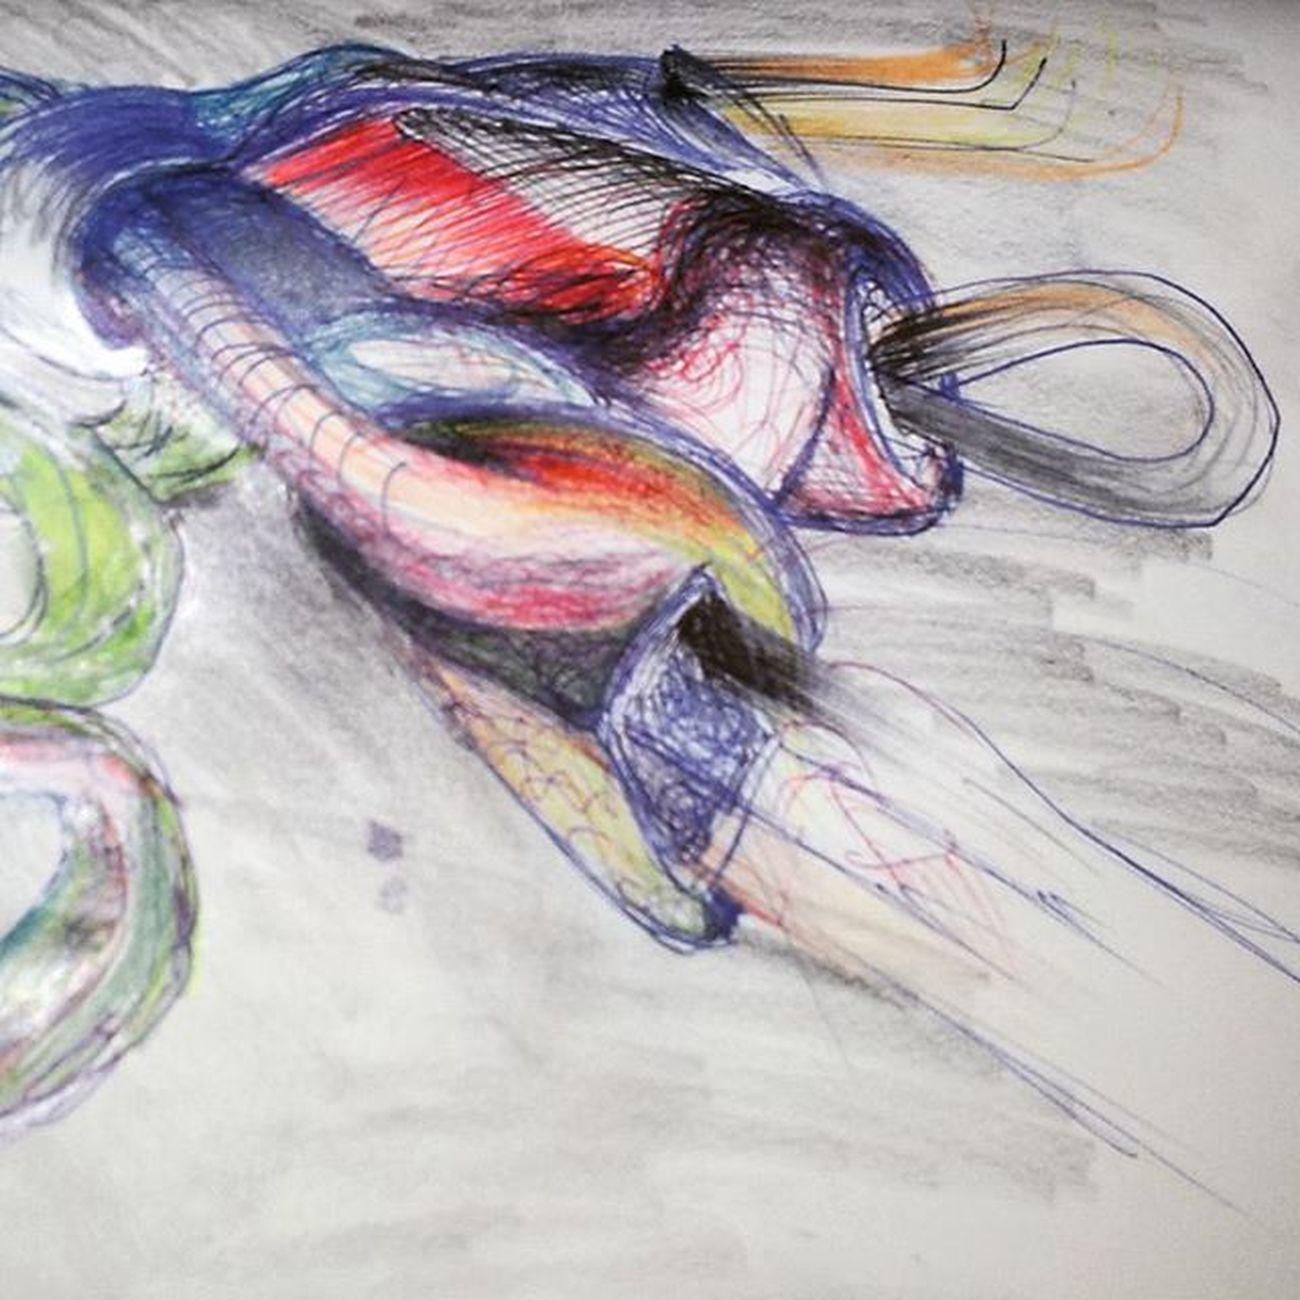 Arminpauldrawing Arminpauldrawing2016 Art Artforever Artfree Fortheart Heart Coeur  Love Drawing Paris Moskau Bologna Hamburg Cologne Köln Organicdrawing Biodrawing Biomech Biomechanical